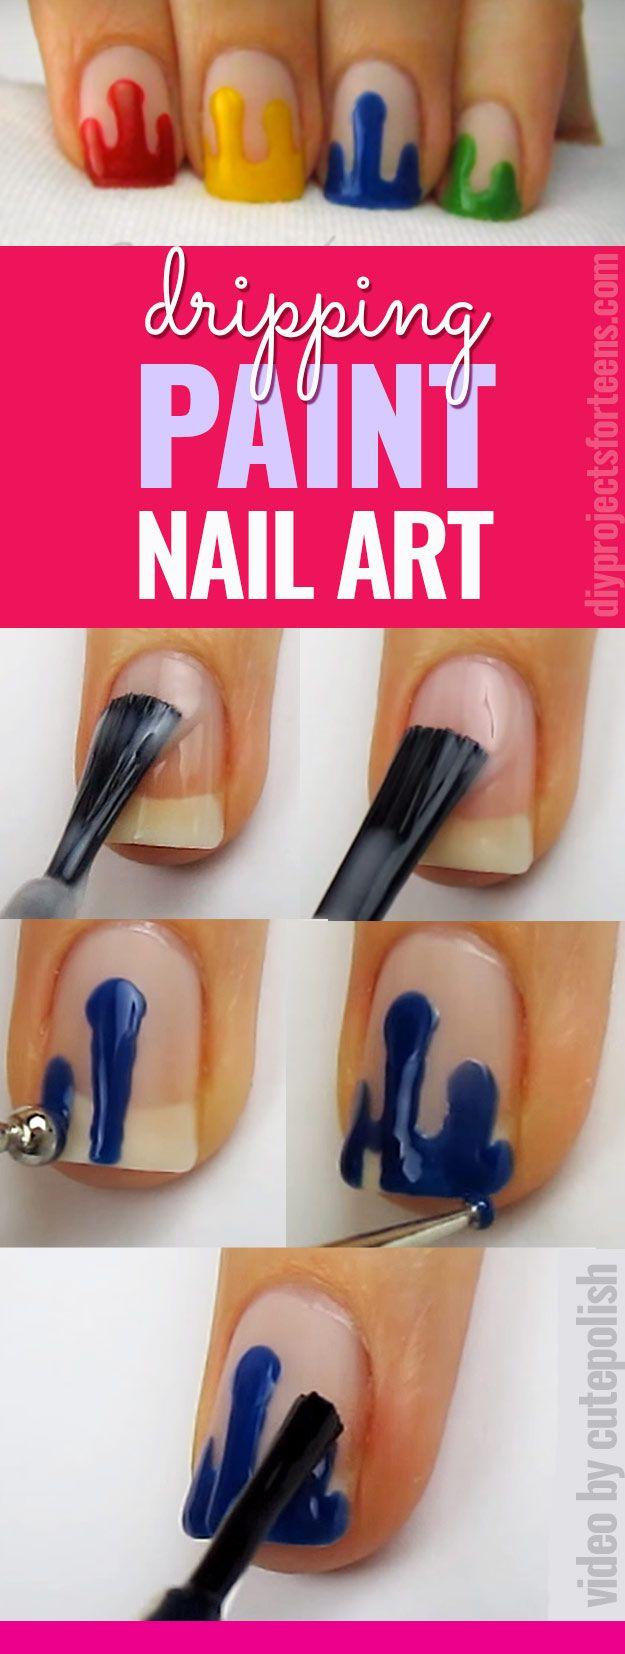 Cool Nail Art Ideas - Dripping Paint Nail Polish - Fun for Teens and Tweens